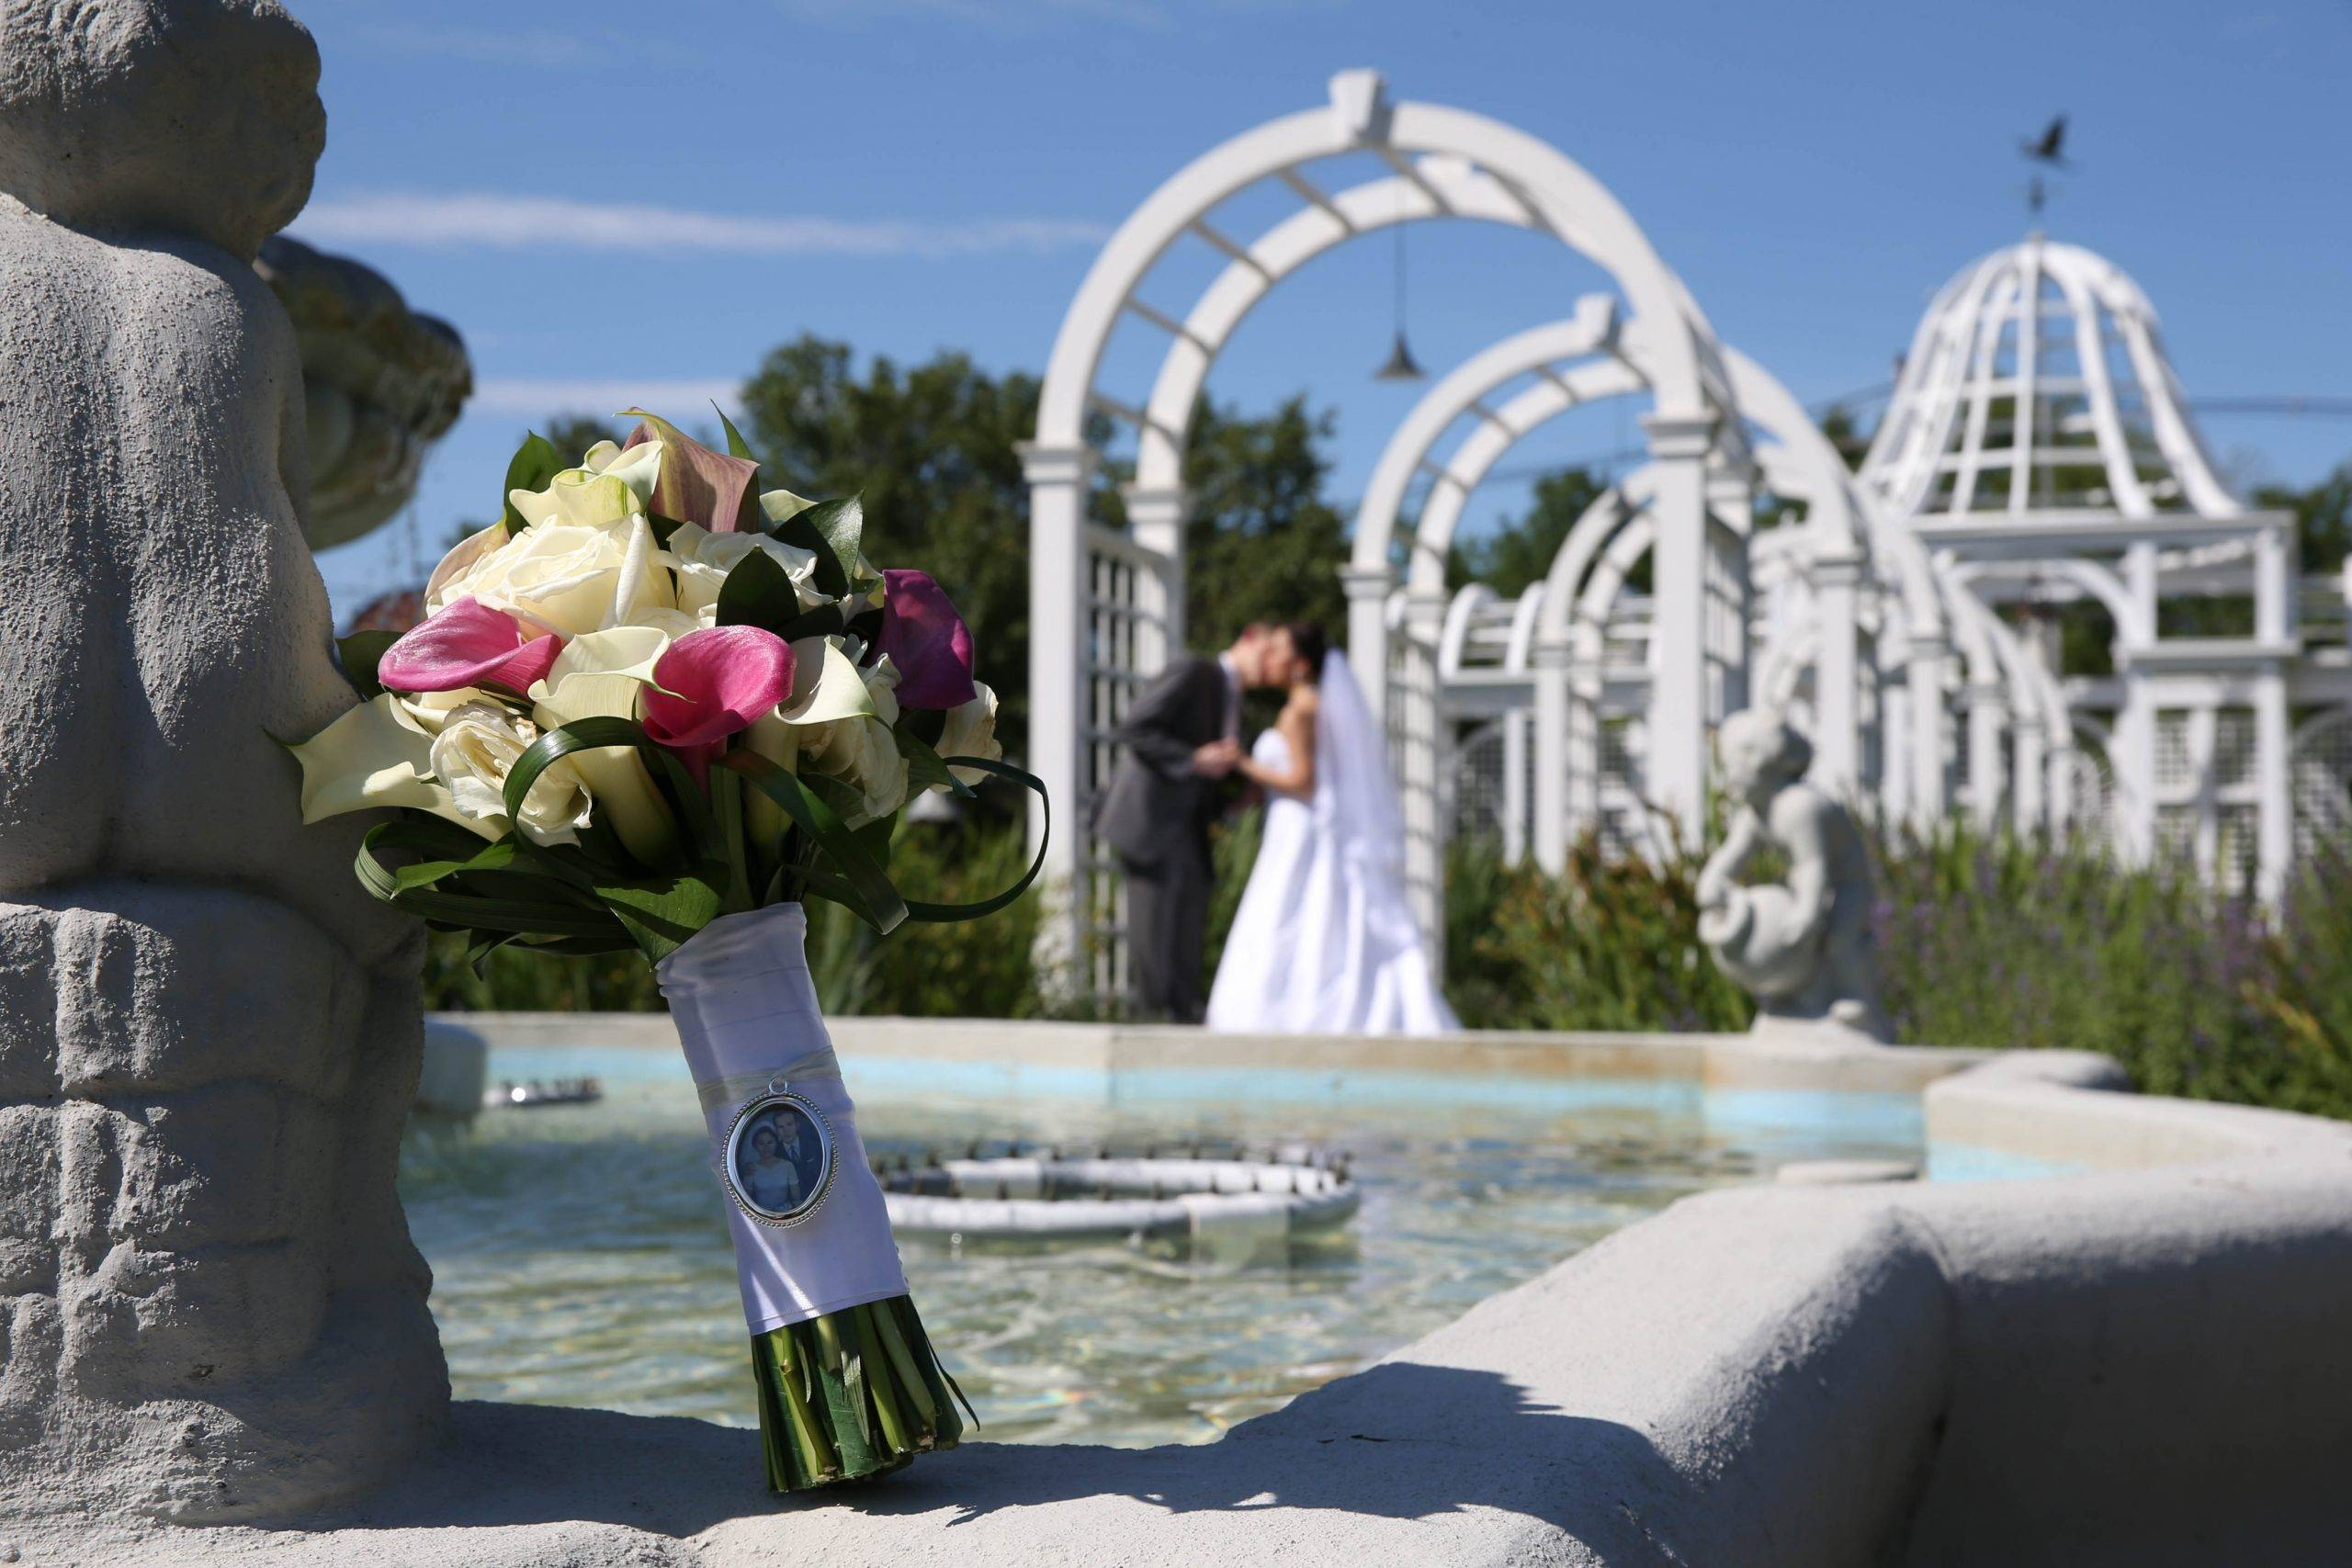 Birchwood Manor kiss by fountain